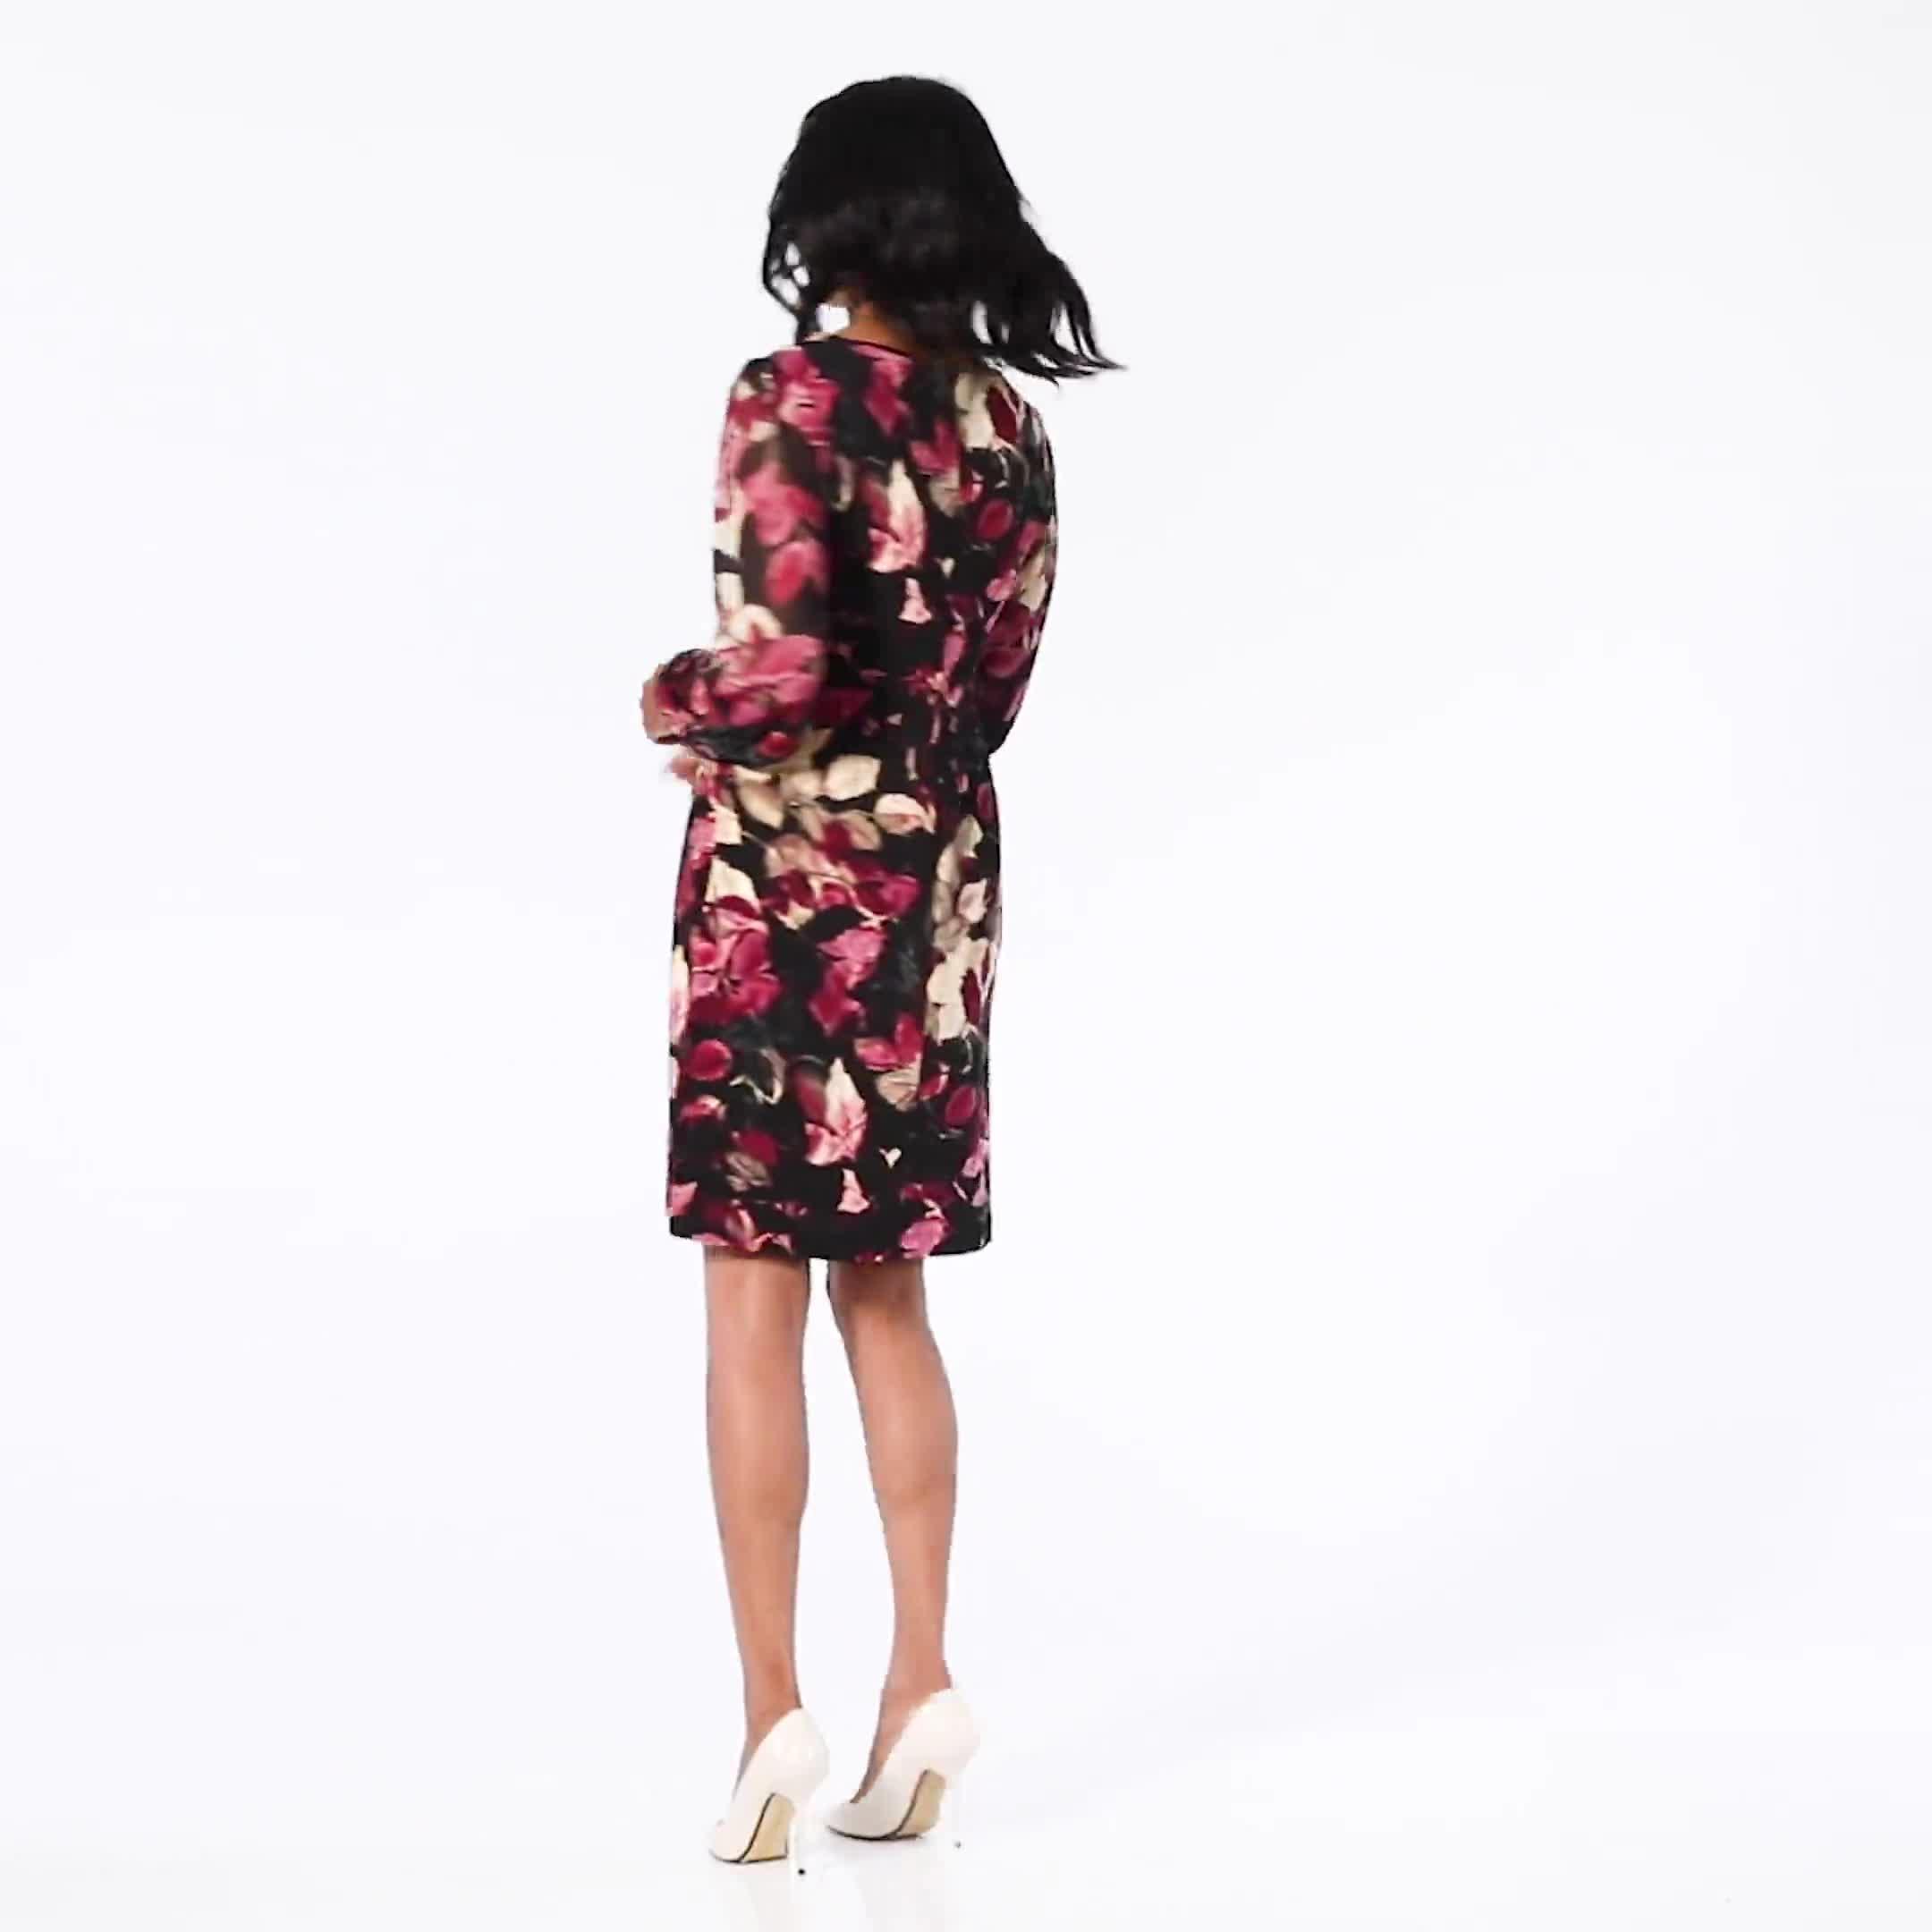 Long Sleeve Rosewood Leaf Printed Sheath Dress - Video